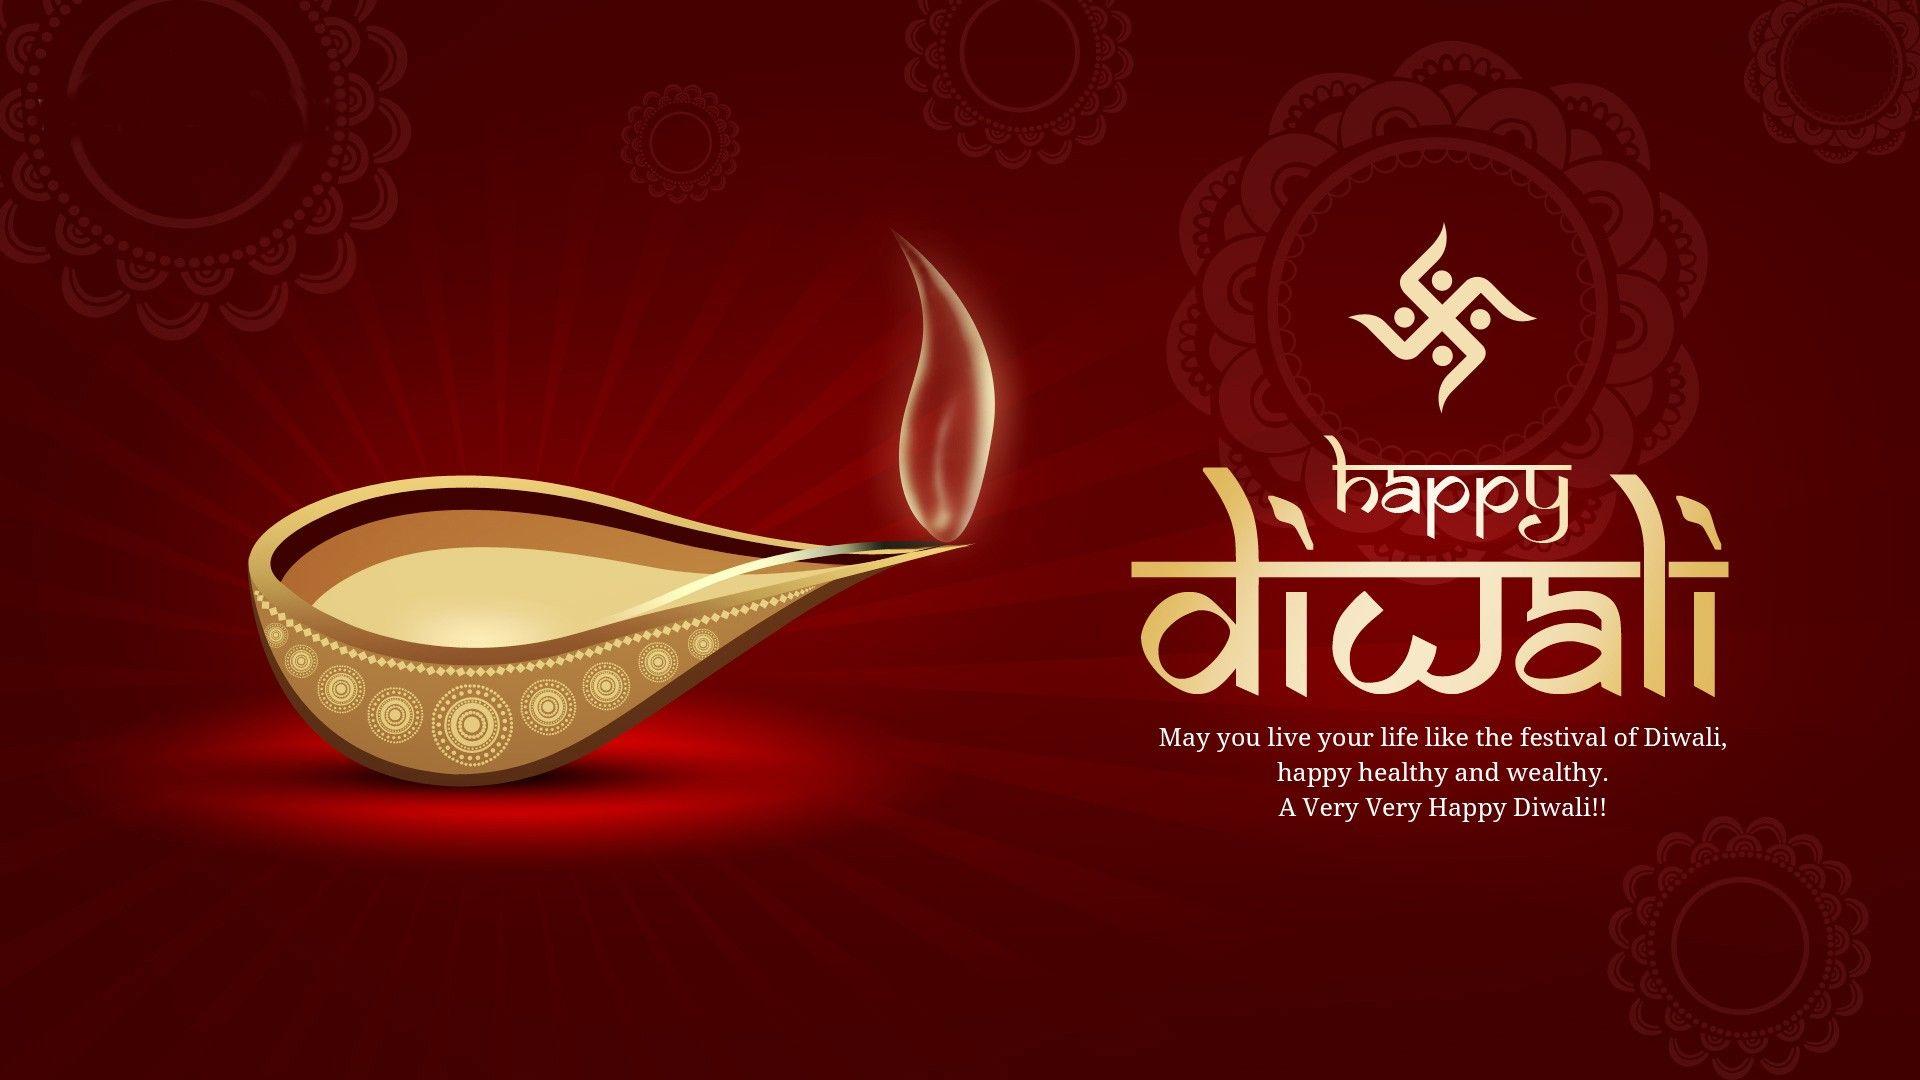 Happy deepavali cards 2014 happy diwali 2014 pinterest happy happy deepavali cards 2014 kristyandbryce Images